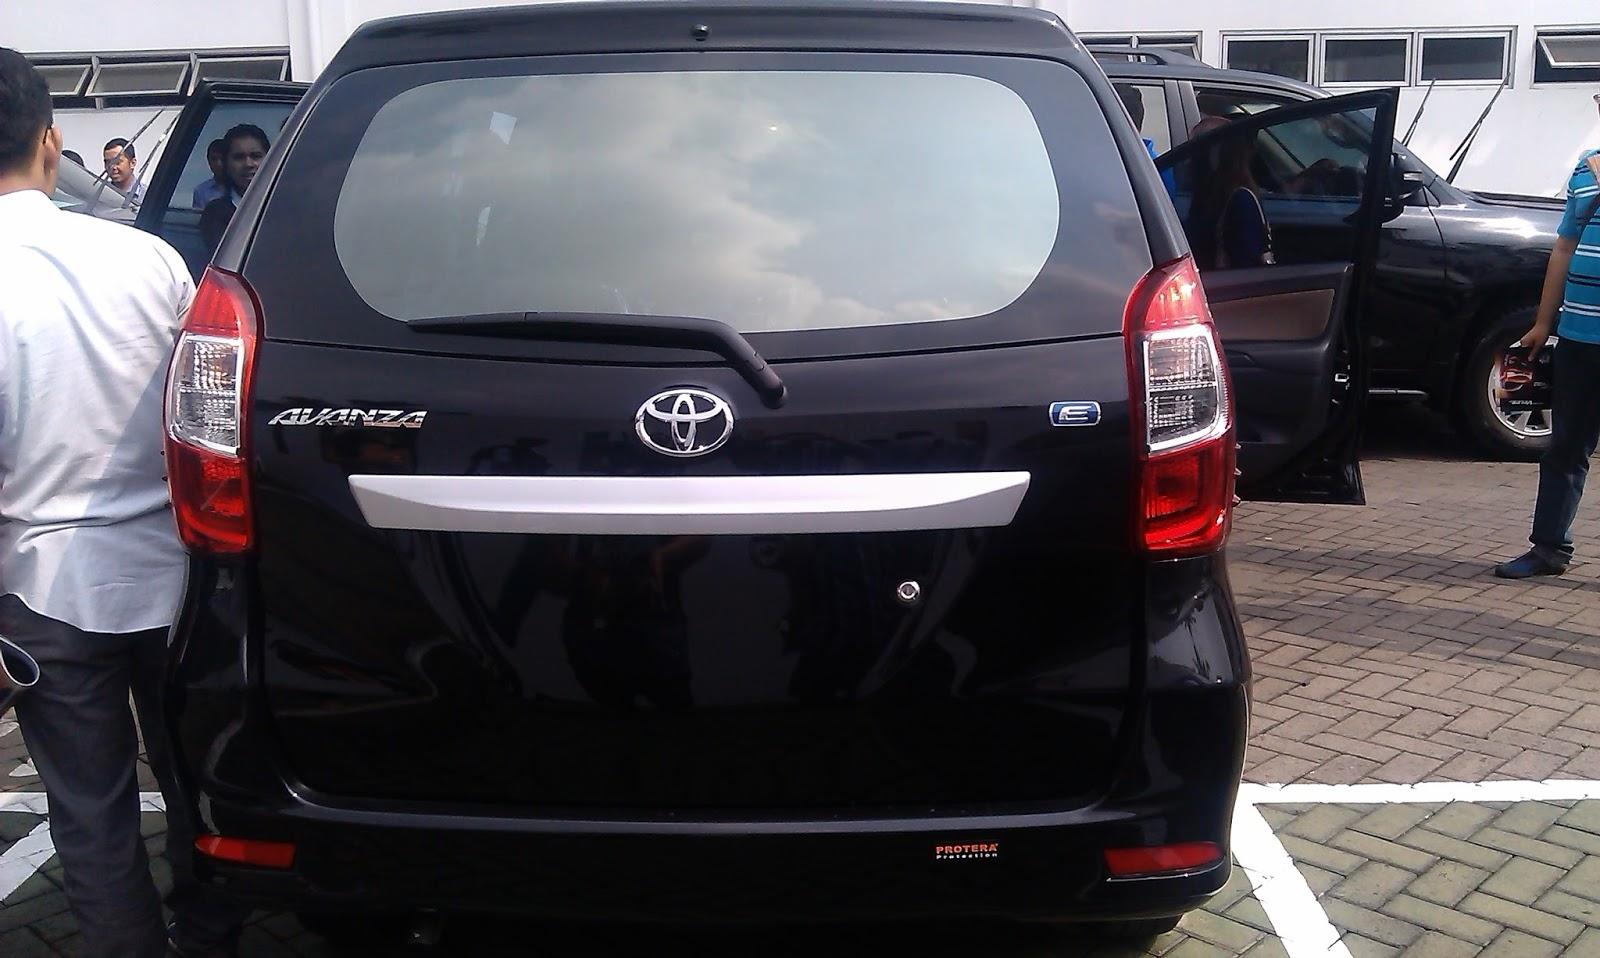 Spesifikasi Grand New Avanza 2015 Toyota 2019 Facelift Promosi